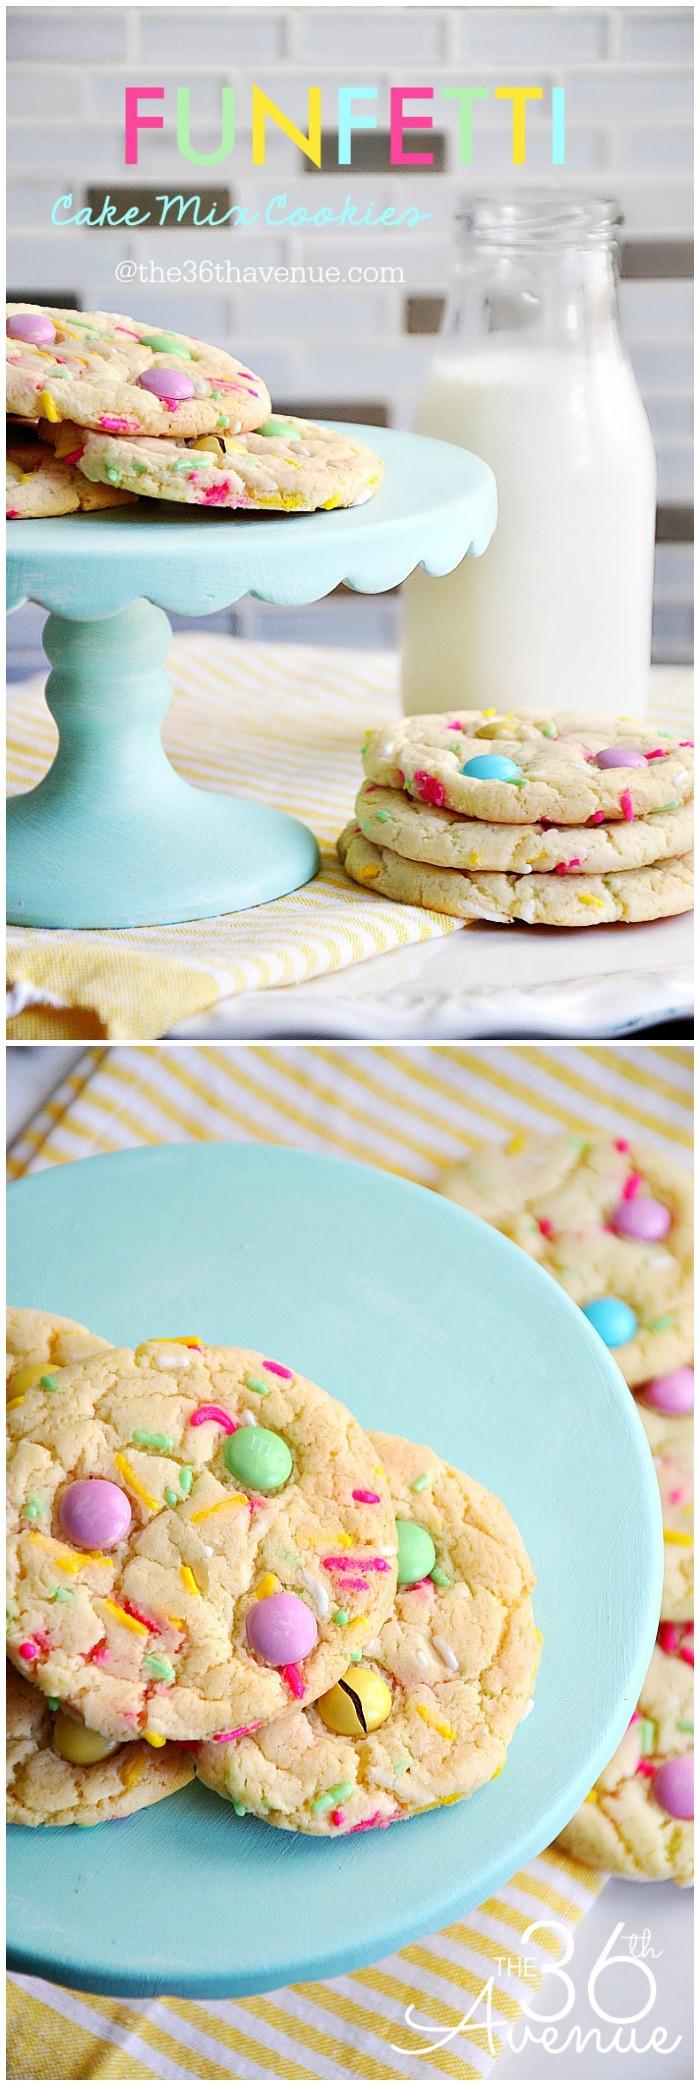 Cake Mix Cookie Recipe  The 36th AVENUE